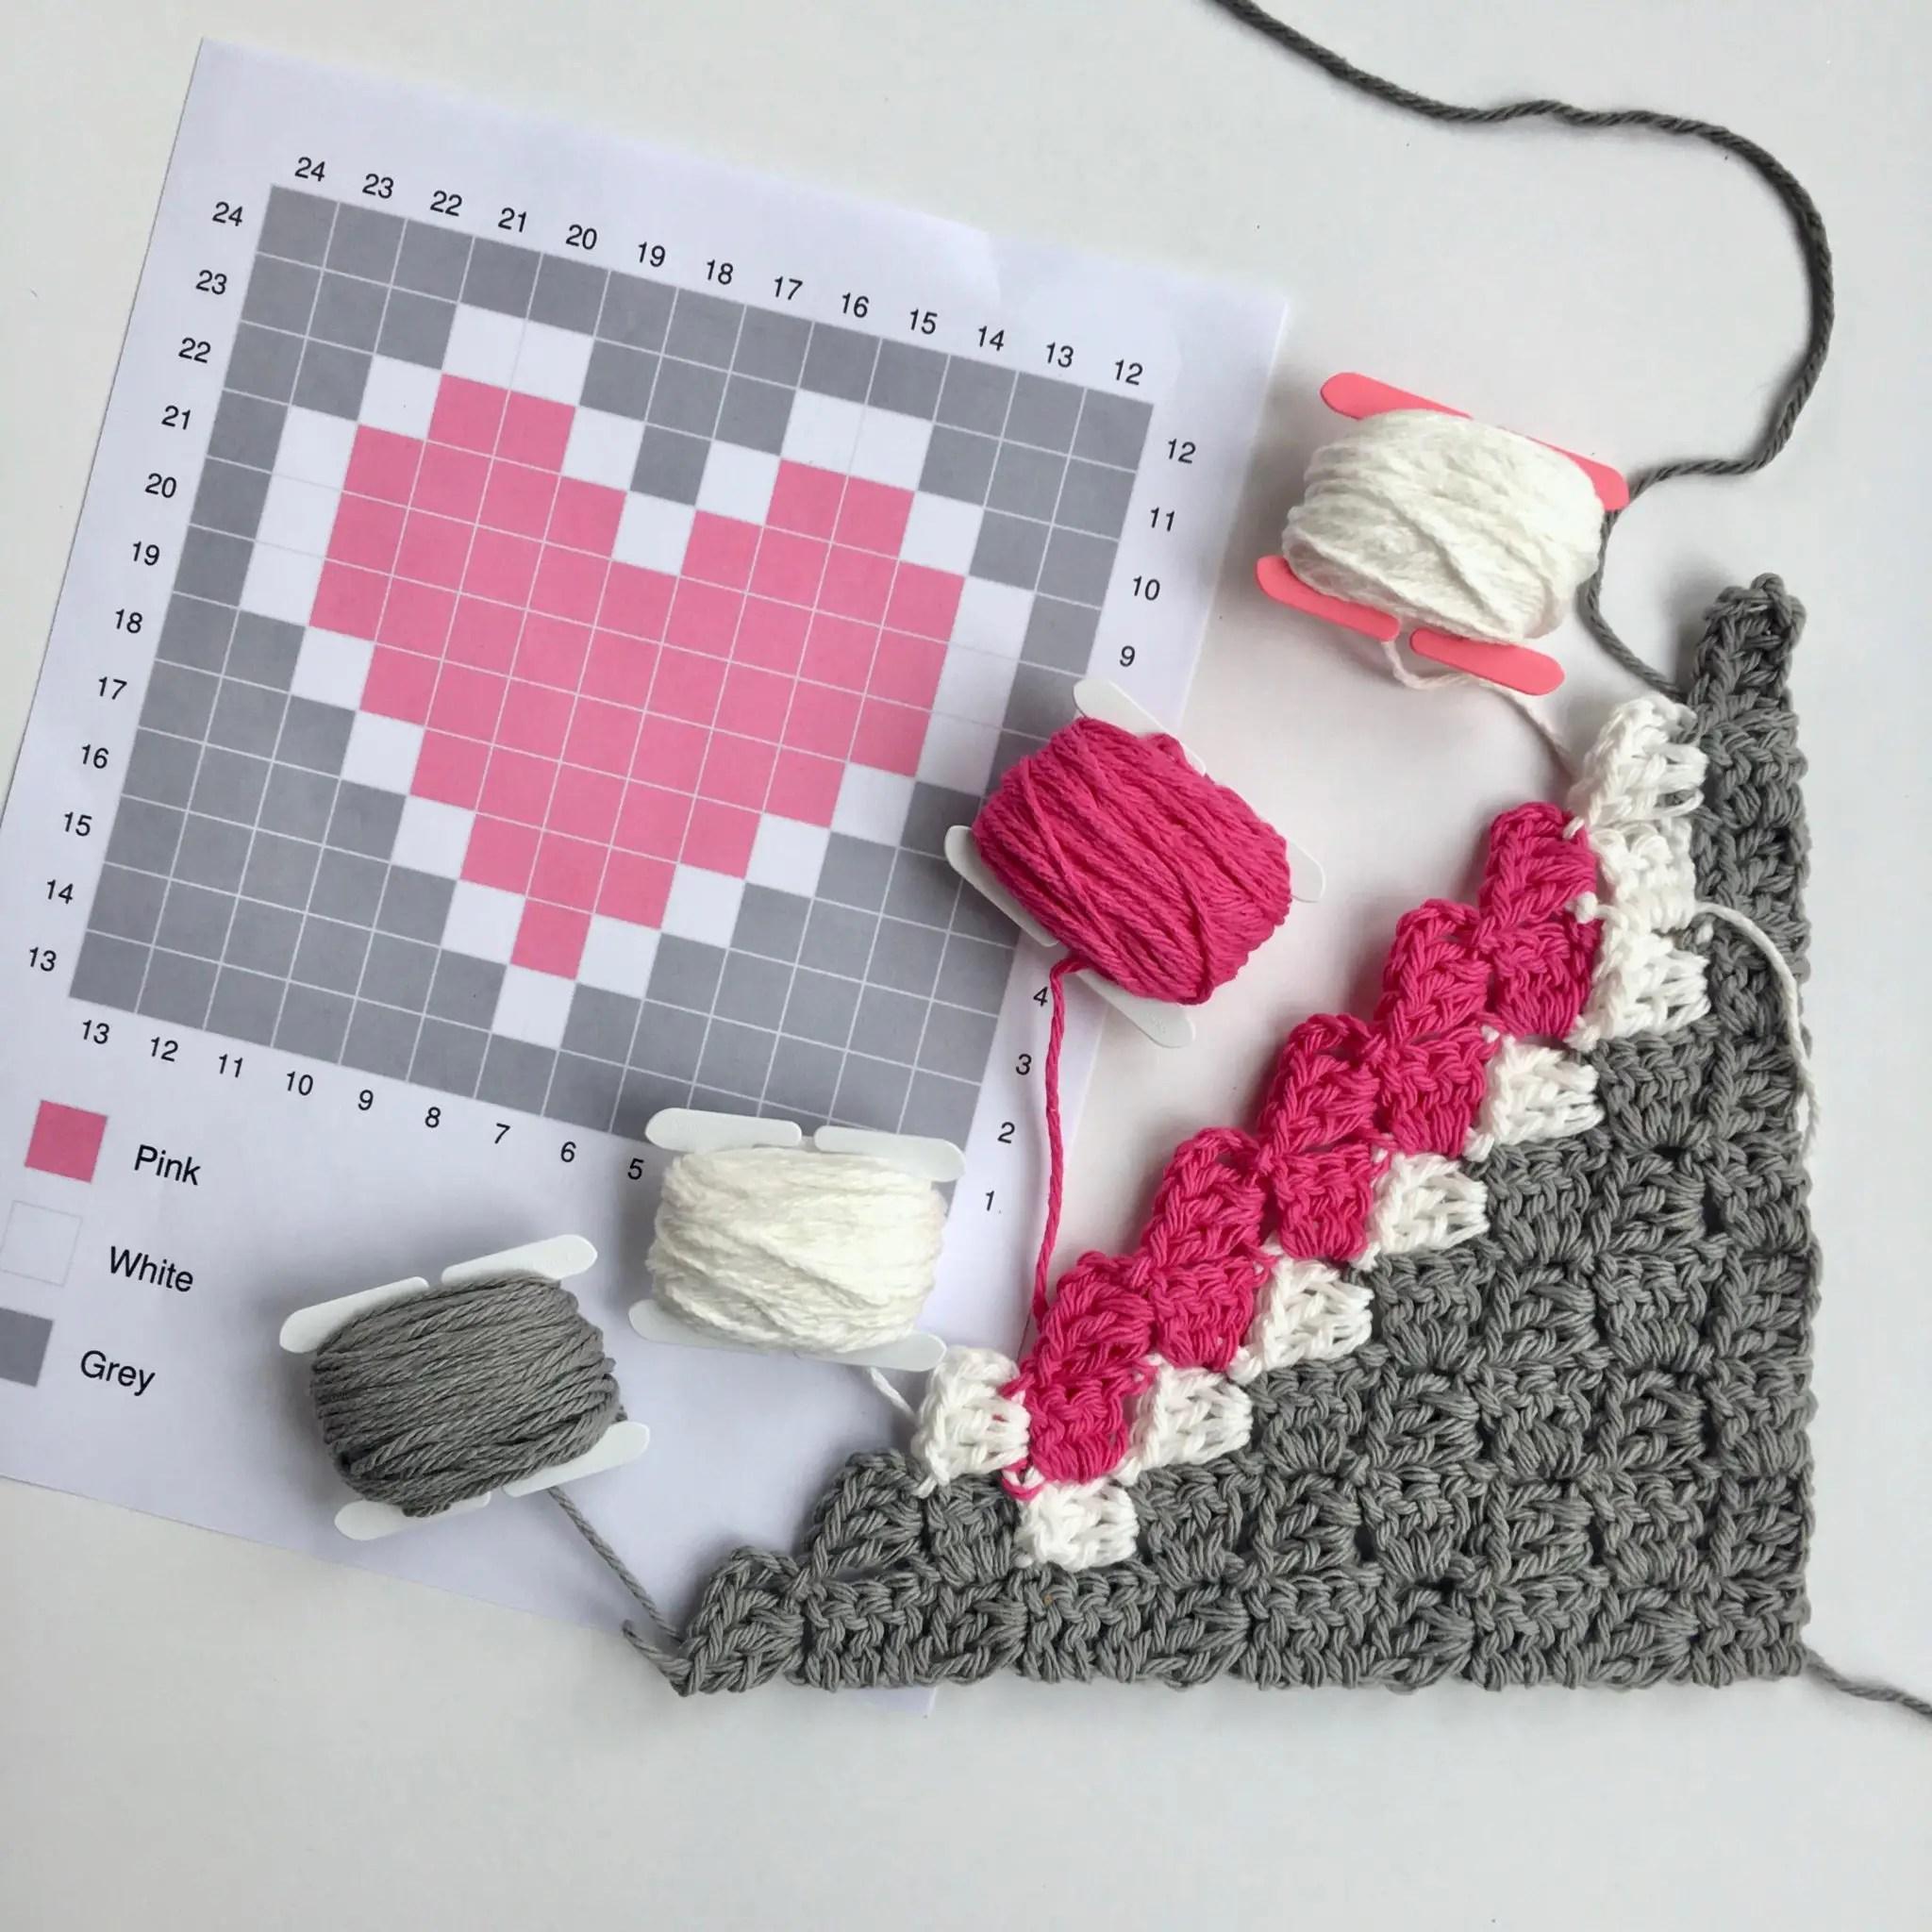 Corner To Corner C2c Basics How To Change Colors Heart Dishcloth